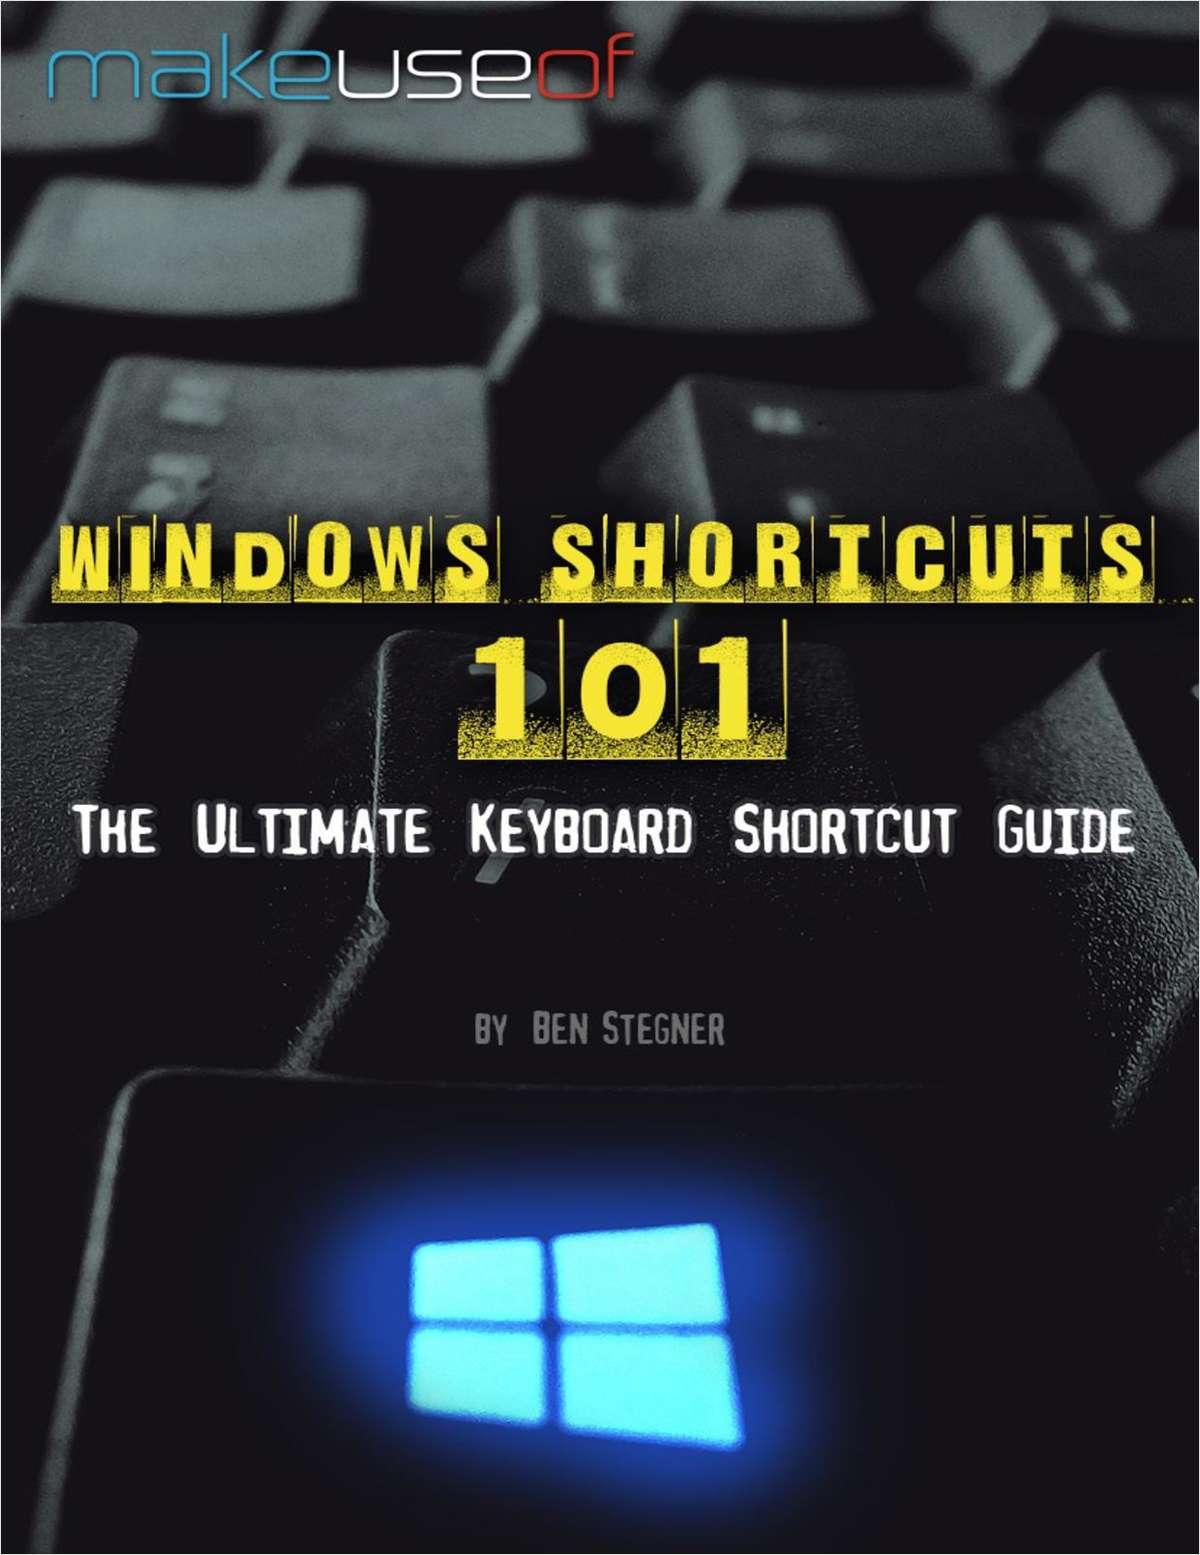 Windows Shortcuts 101: The Ultimate Keyboard Shortcut Guide